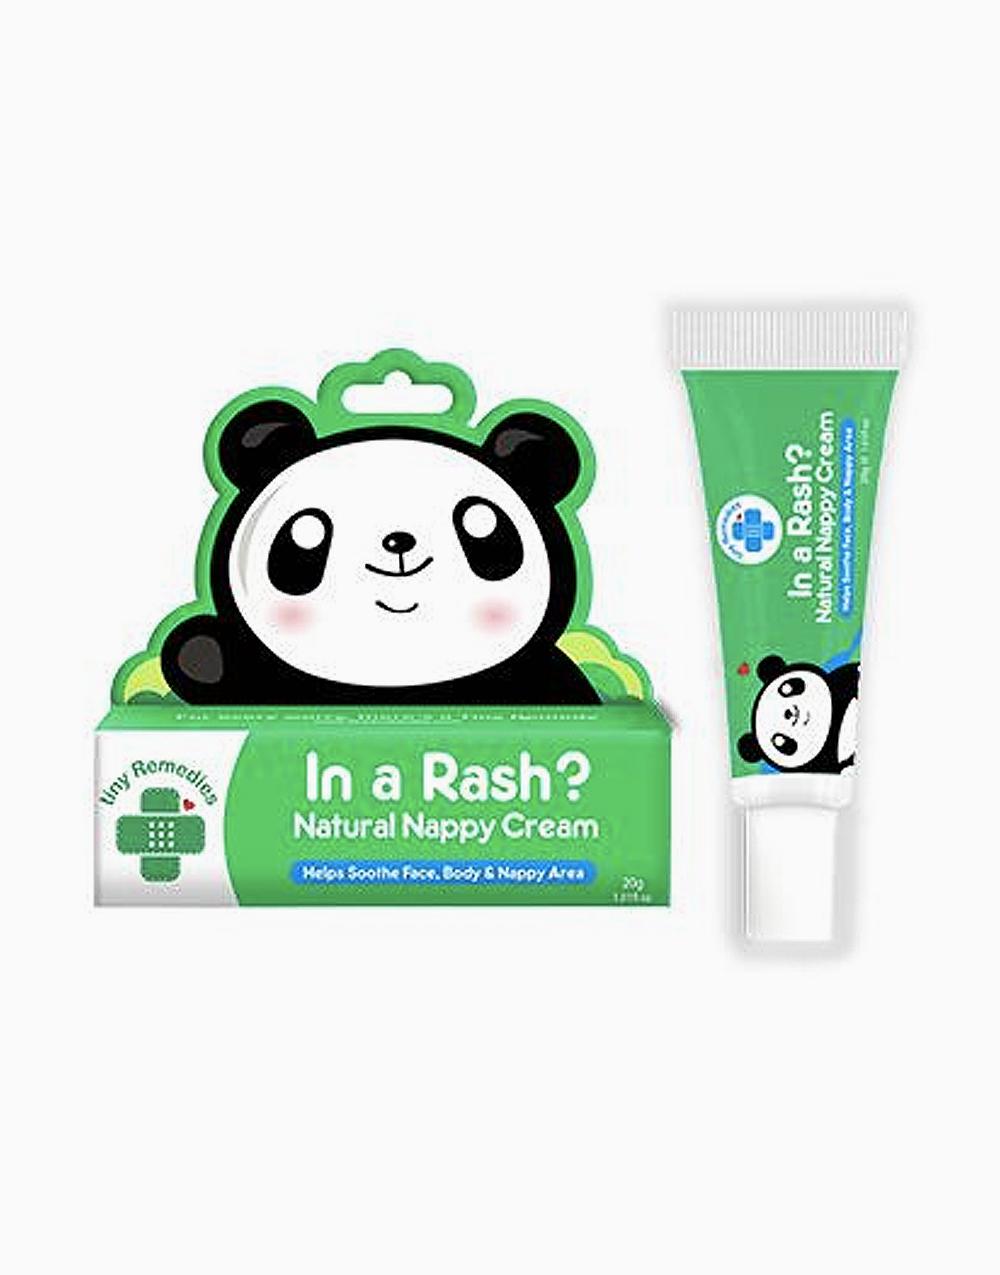 Natural Diaper & Rash Cream - In a Rash by Tiny Buds